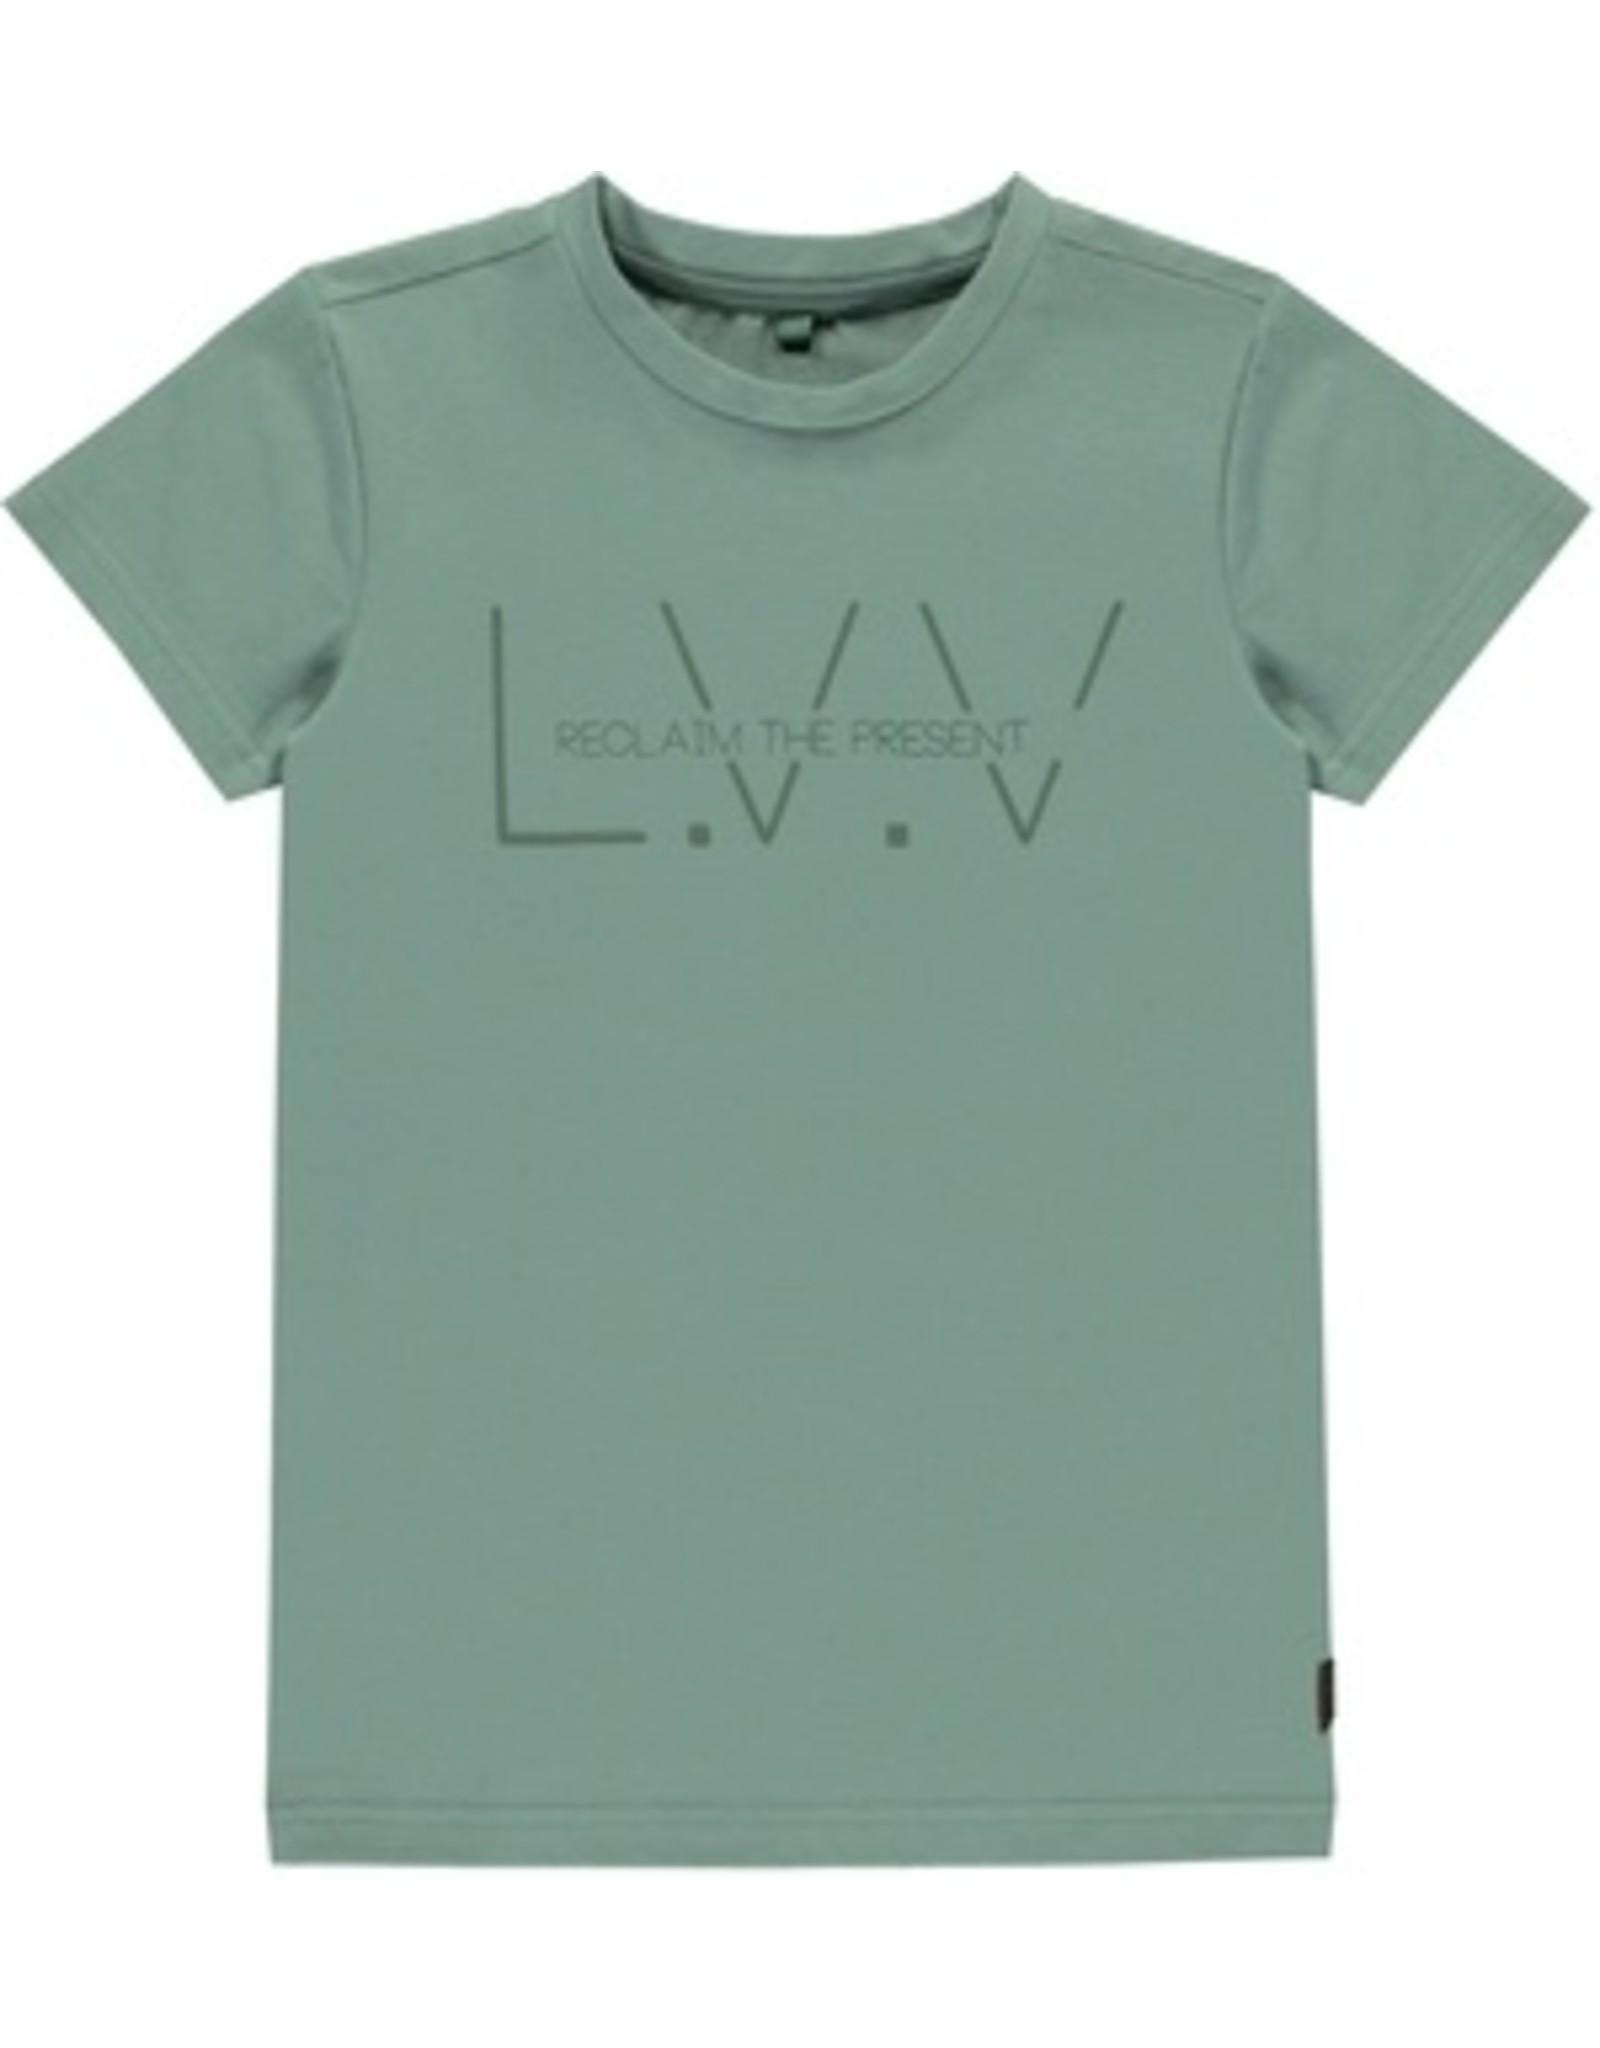 Levv T-shirt logo dusty Green